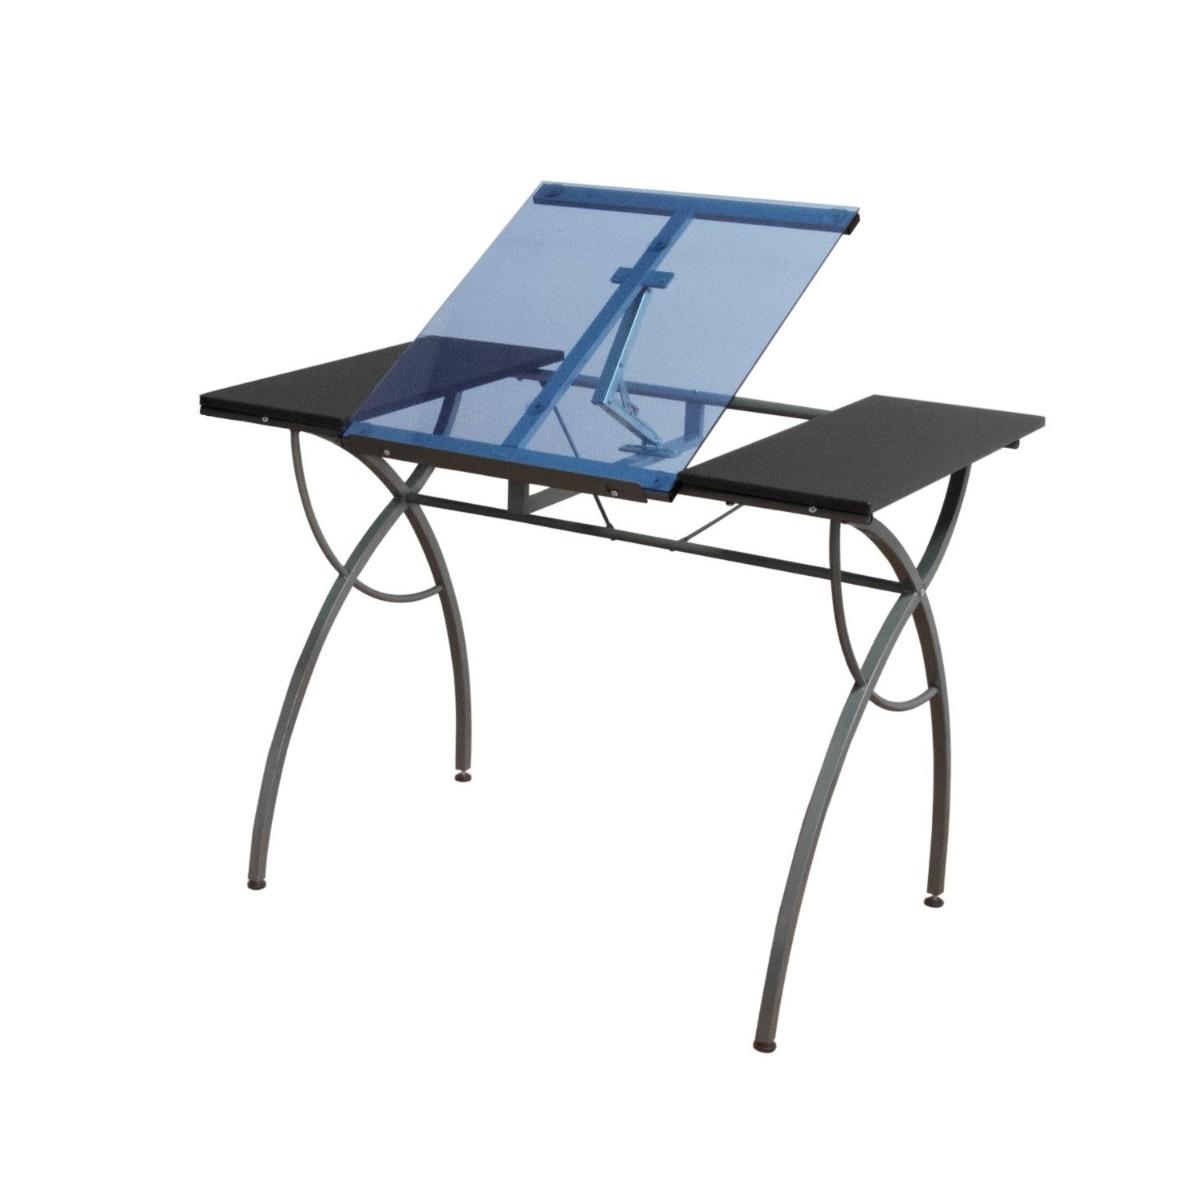 Mesa para dibujo cristal escritorio dibujar ajustable vbf 3 en mercado libre - Mesa de dibujo portatil ...